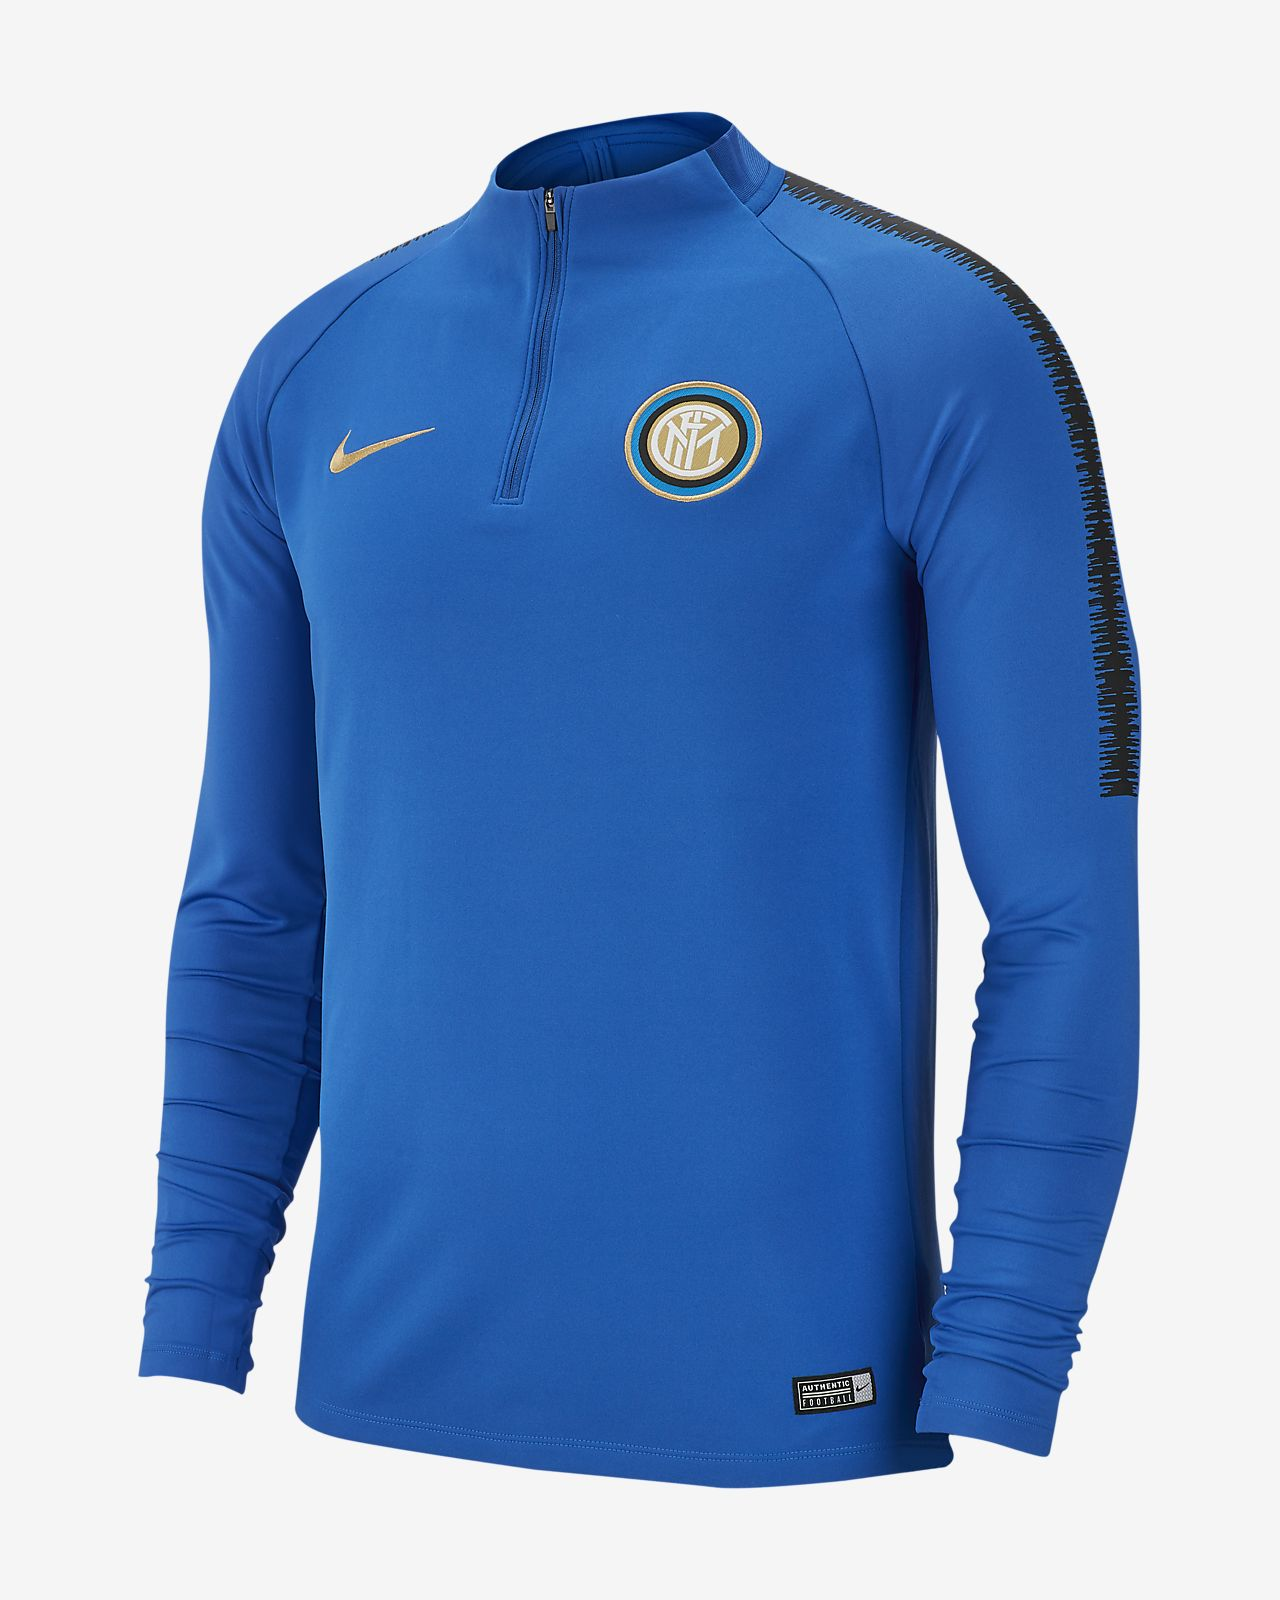 eb3a6ba1011b Inter Milan Dri-FIT Squad Drill Men's Long-Sleeve Football Top. Nike ...